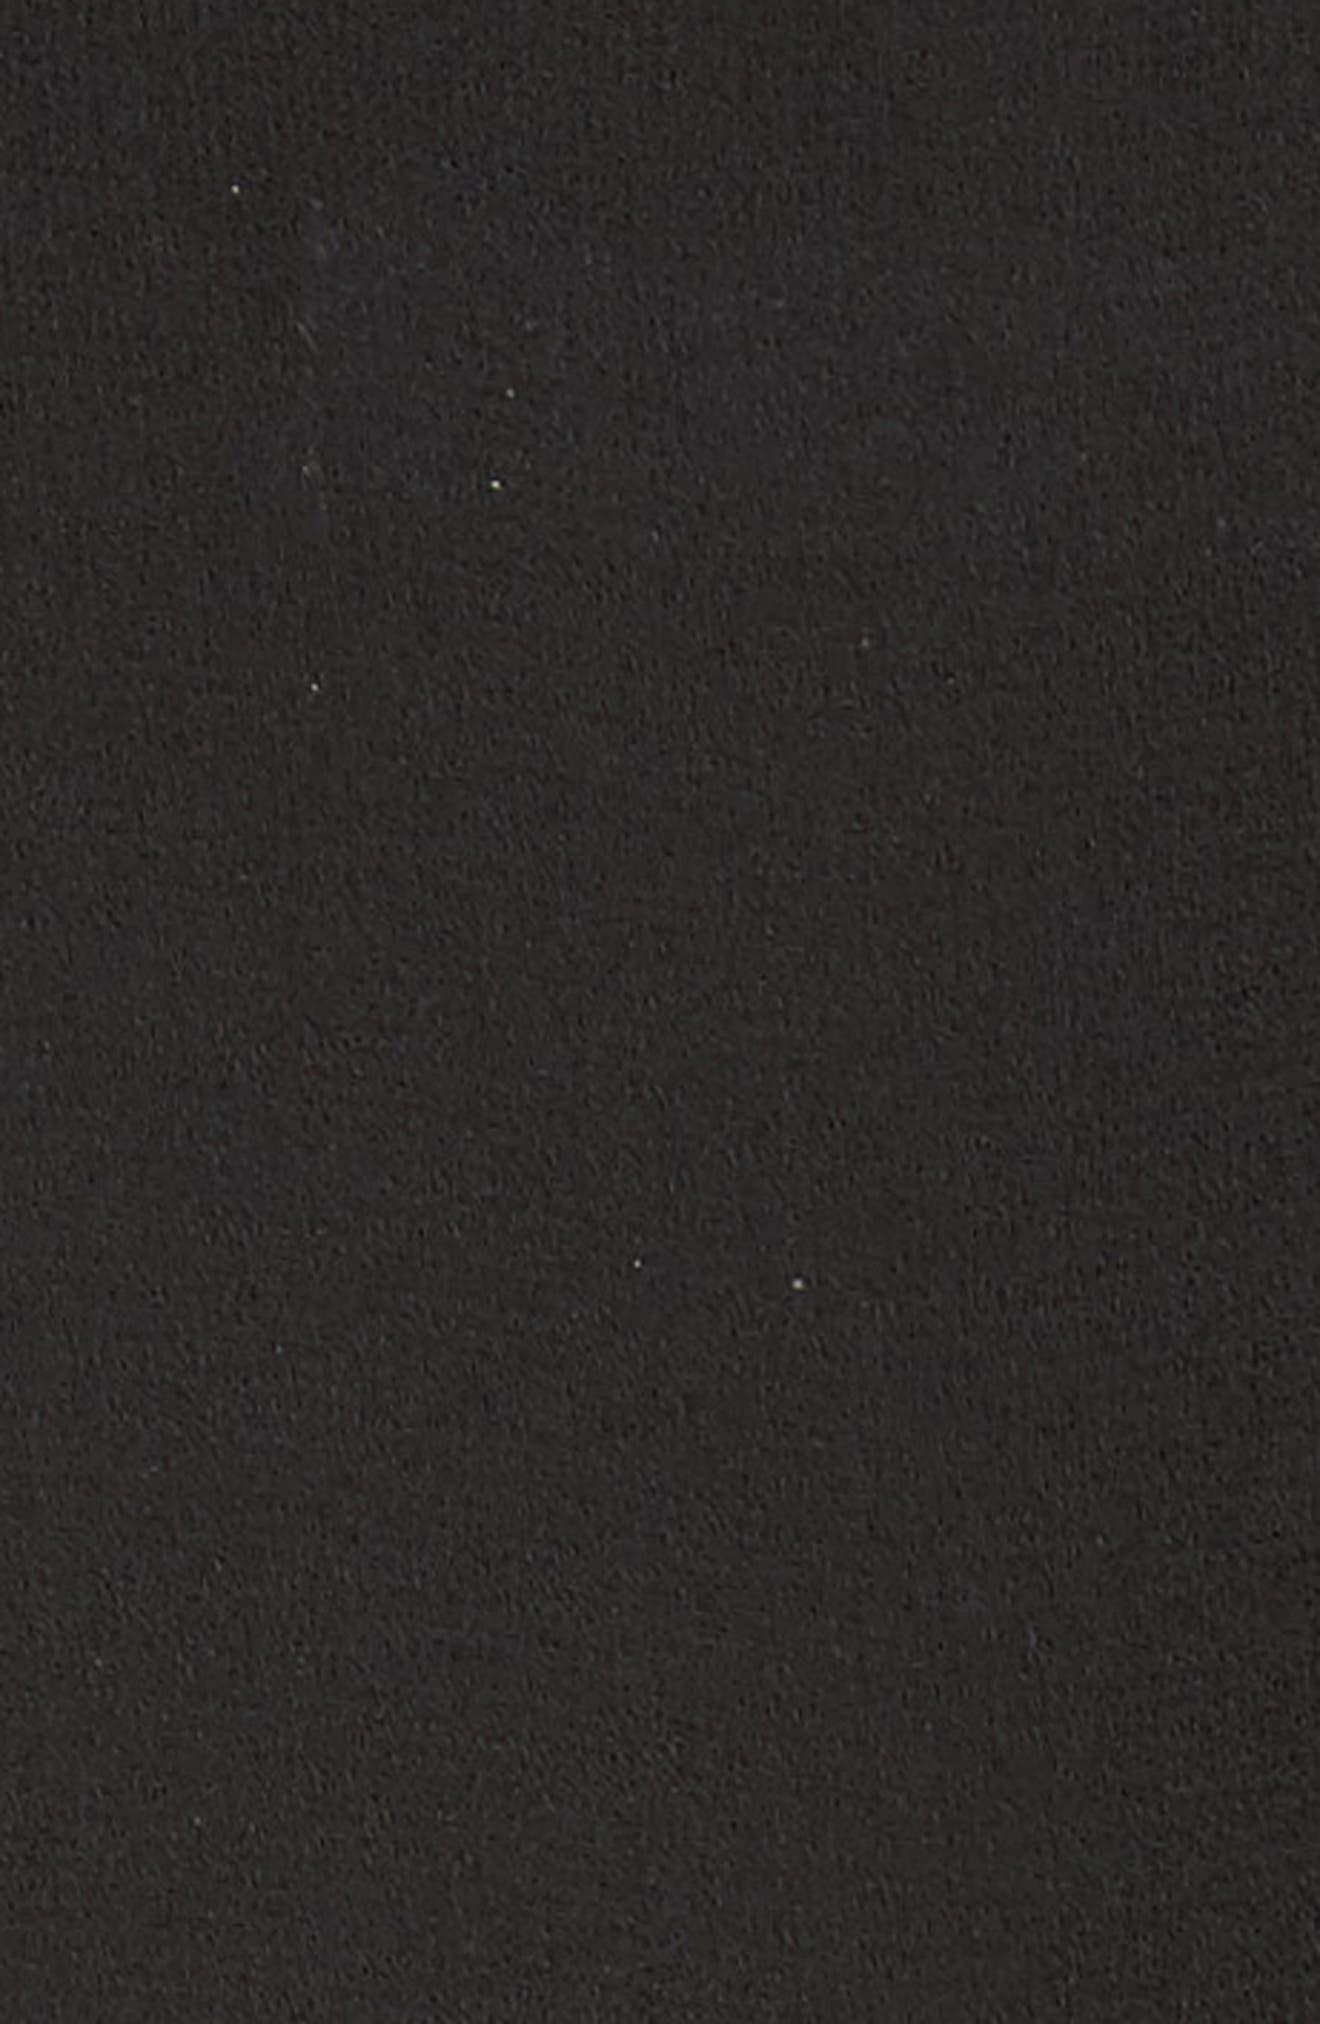 Sheer Pleated Blouse,                             Alternate thumbnail 5, color,                             Noir